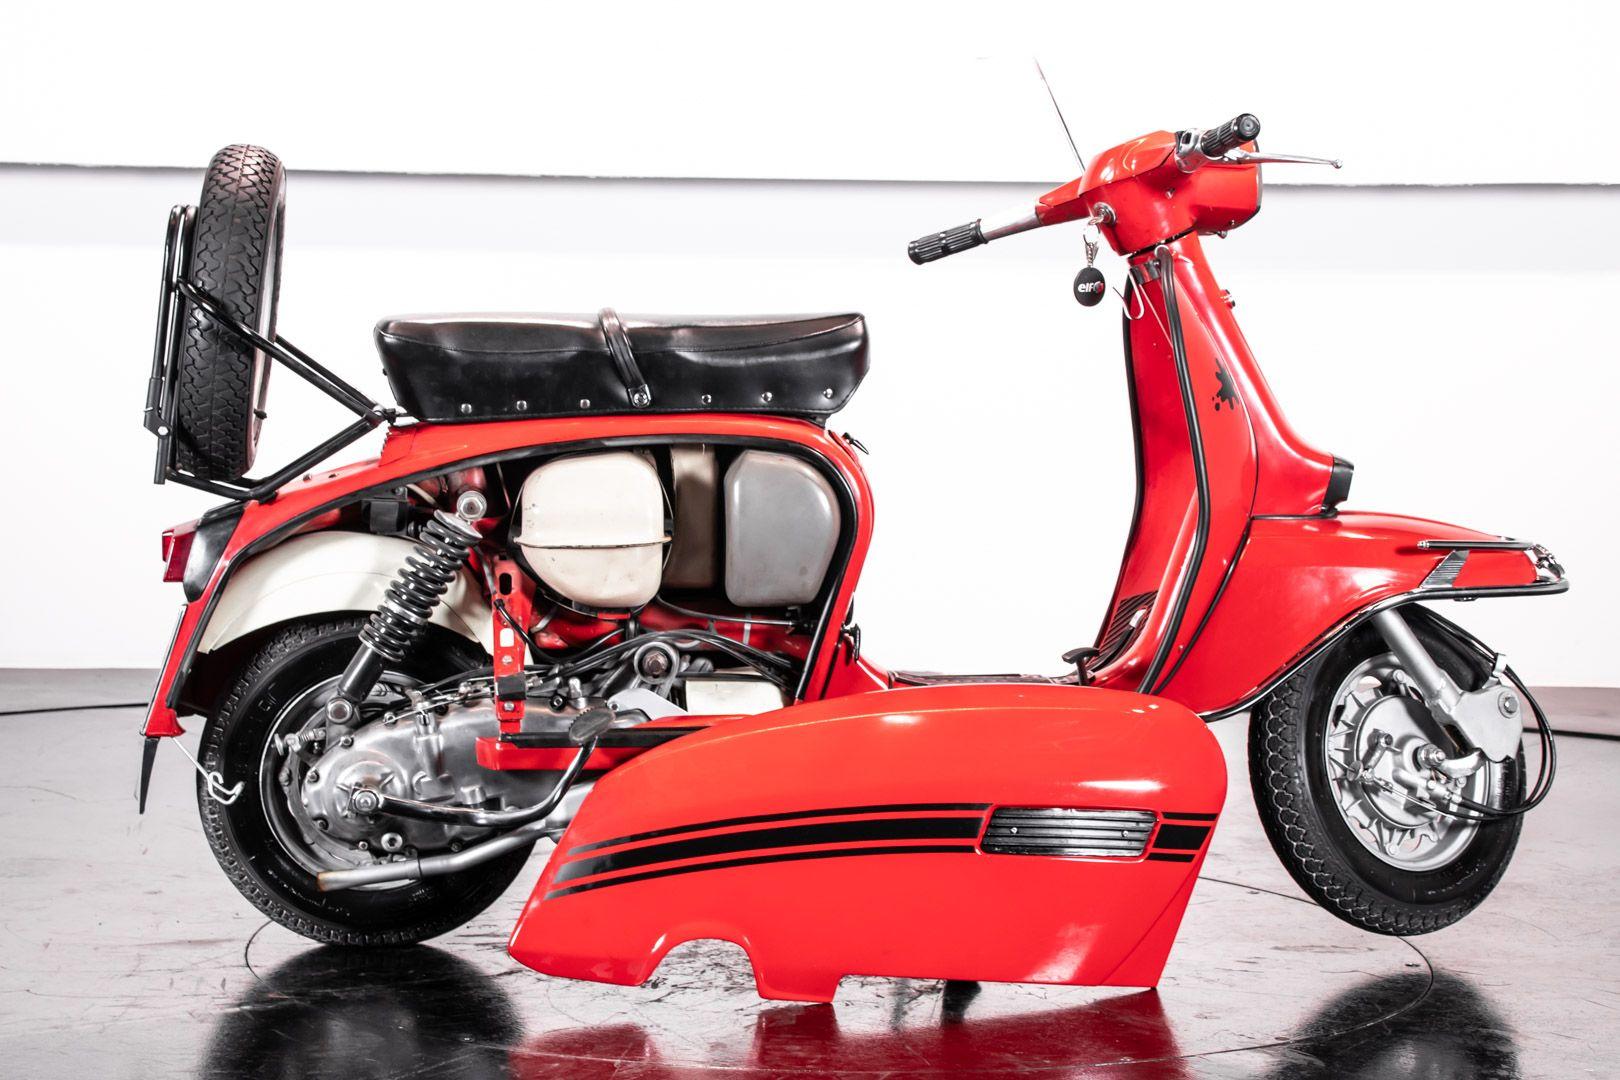 1970 Innocenti Lambretta DL150 Macchia Nera 82468